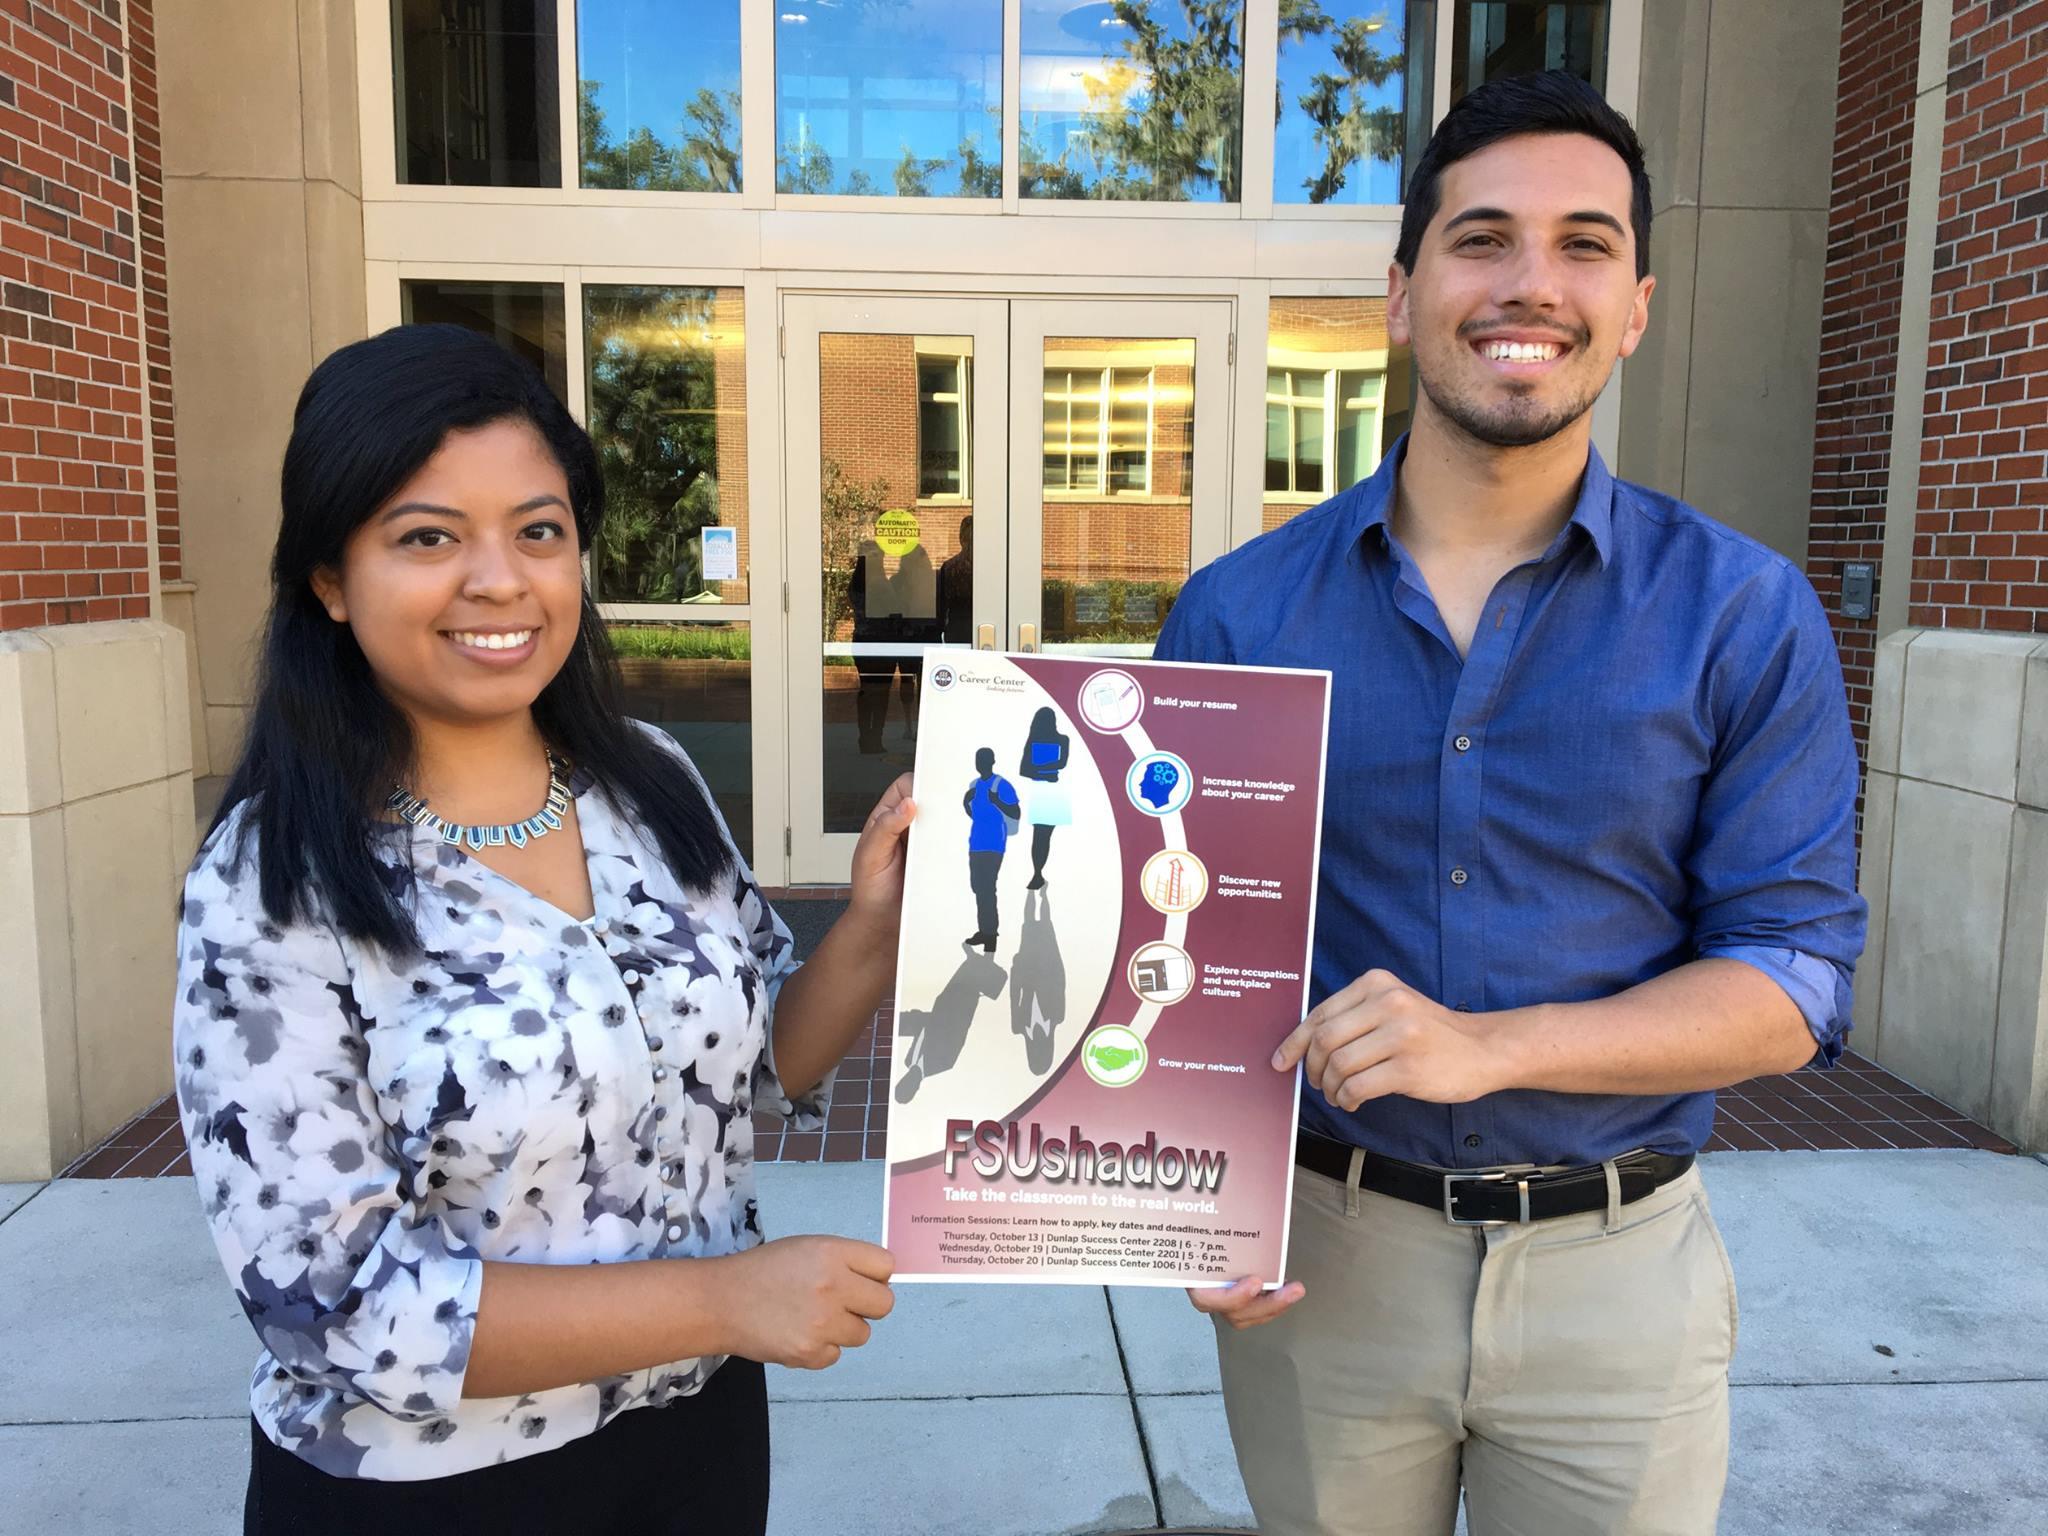 new fsu job shadowing program helps students gain insight into new fsu job shadowing program helps students gain insight into employment florida state university news